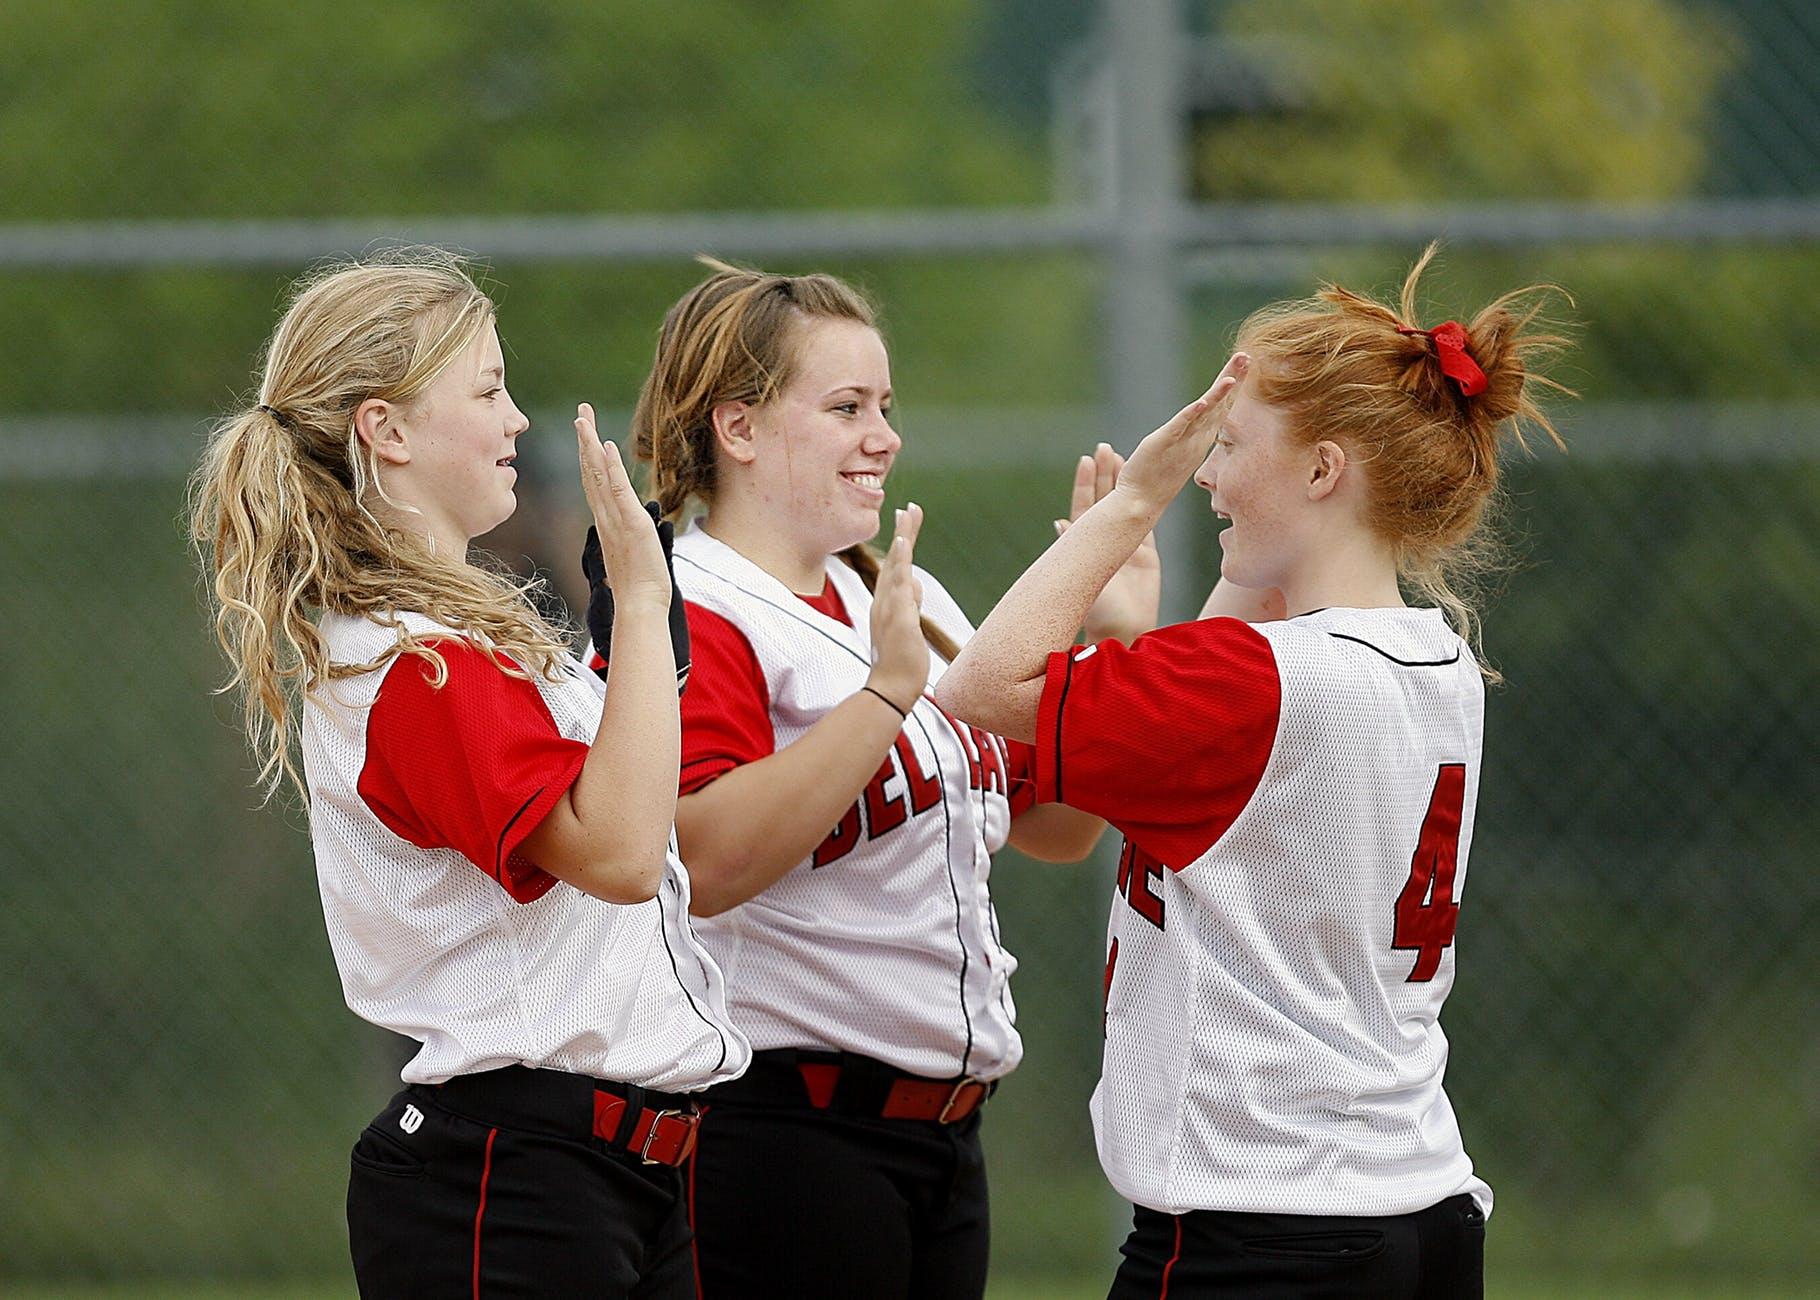 softball-girls-team-mates-happy-163465.jpeg